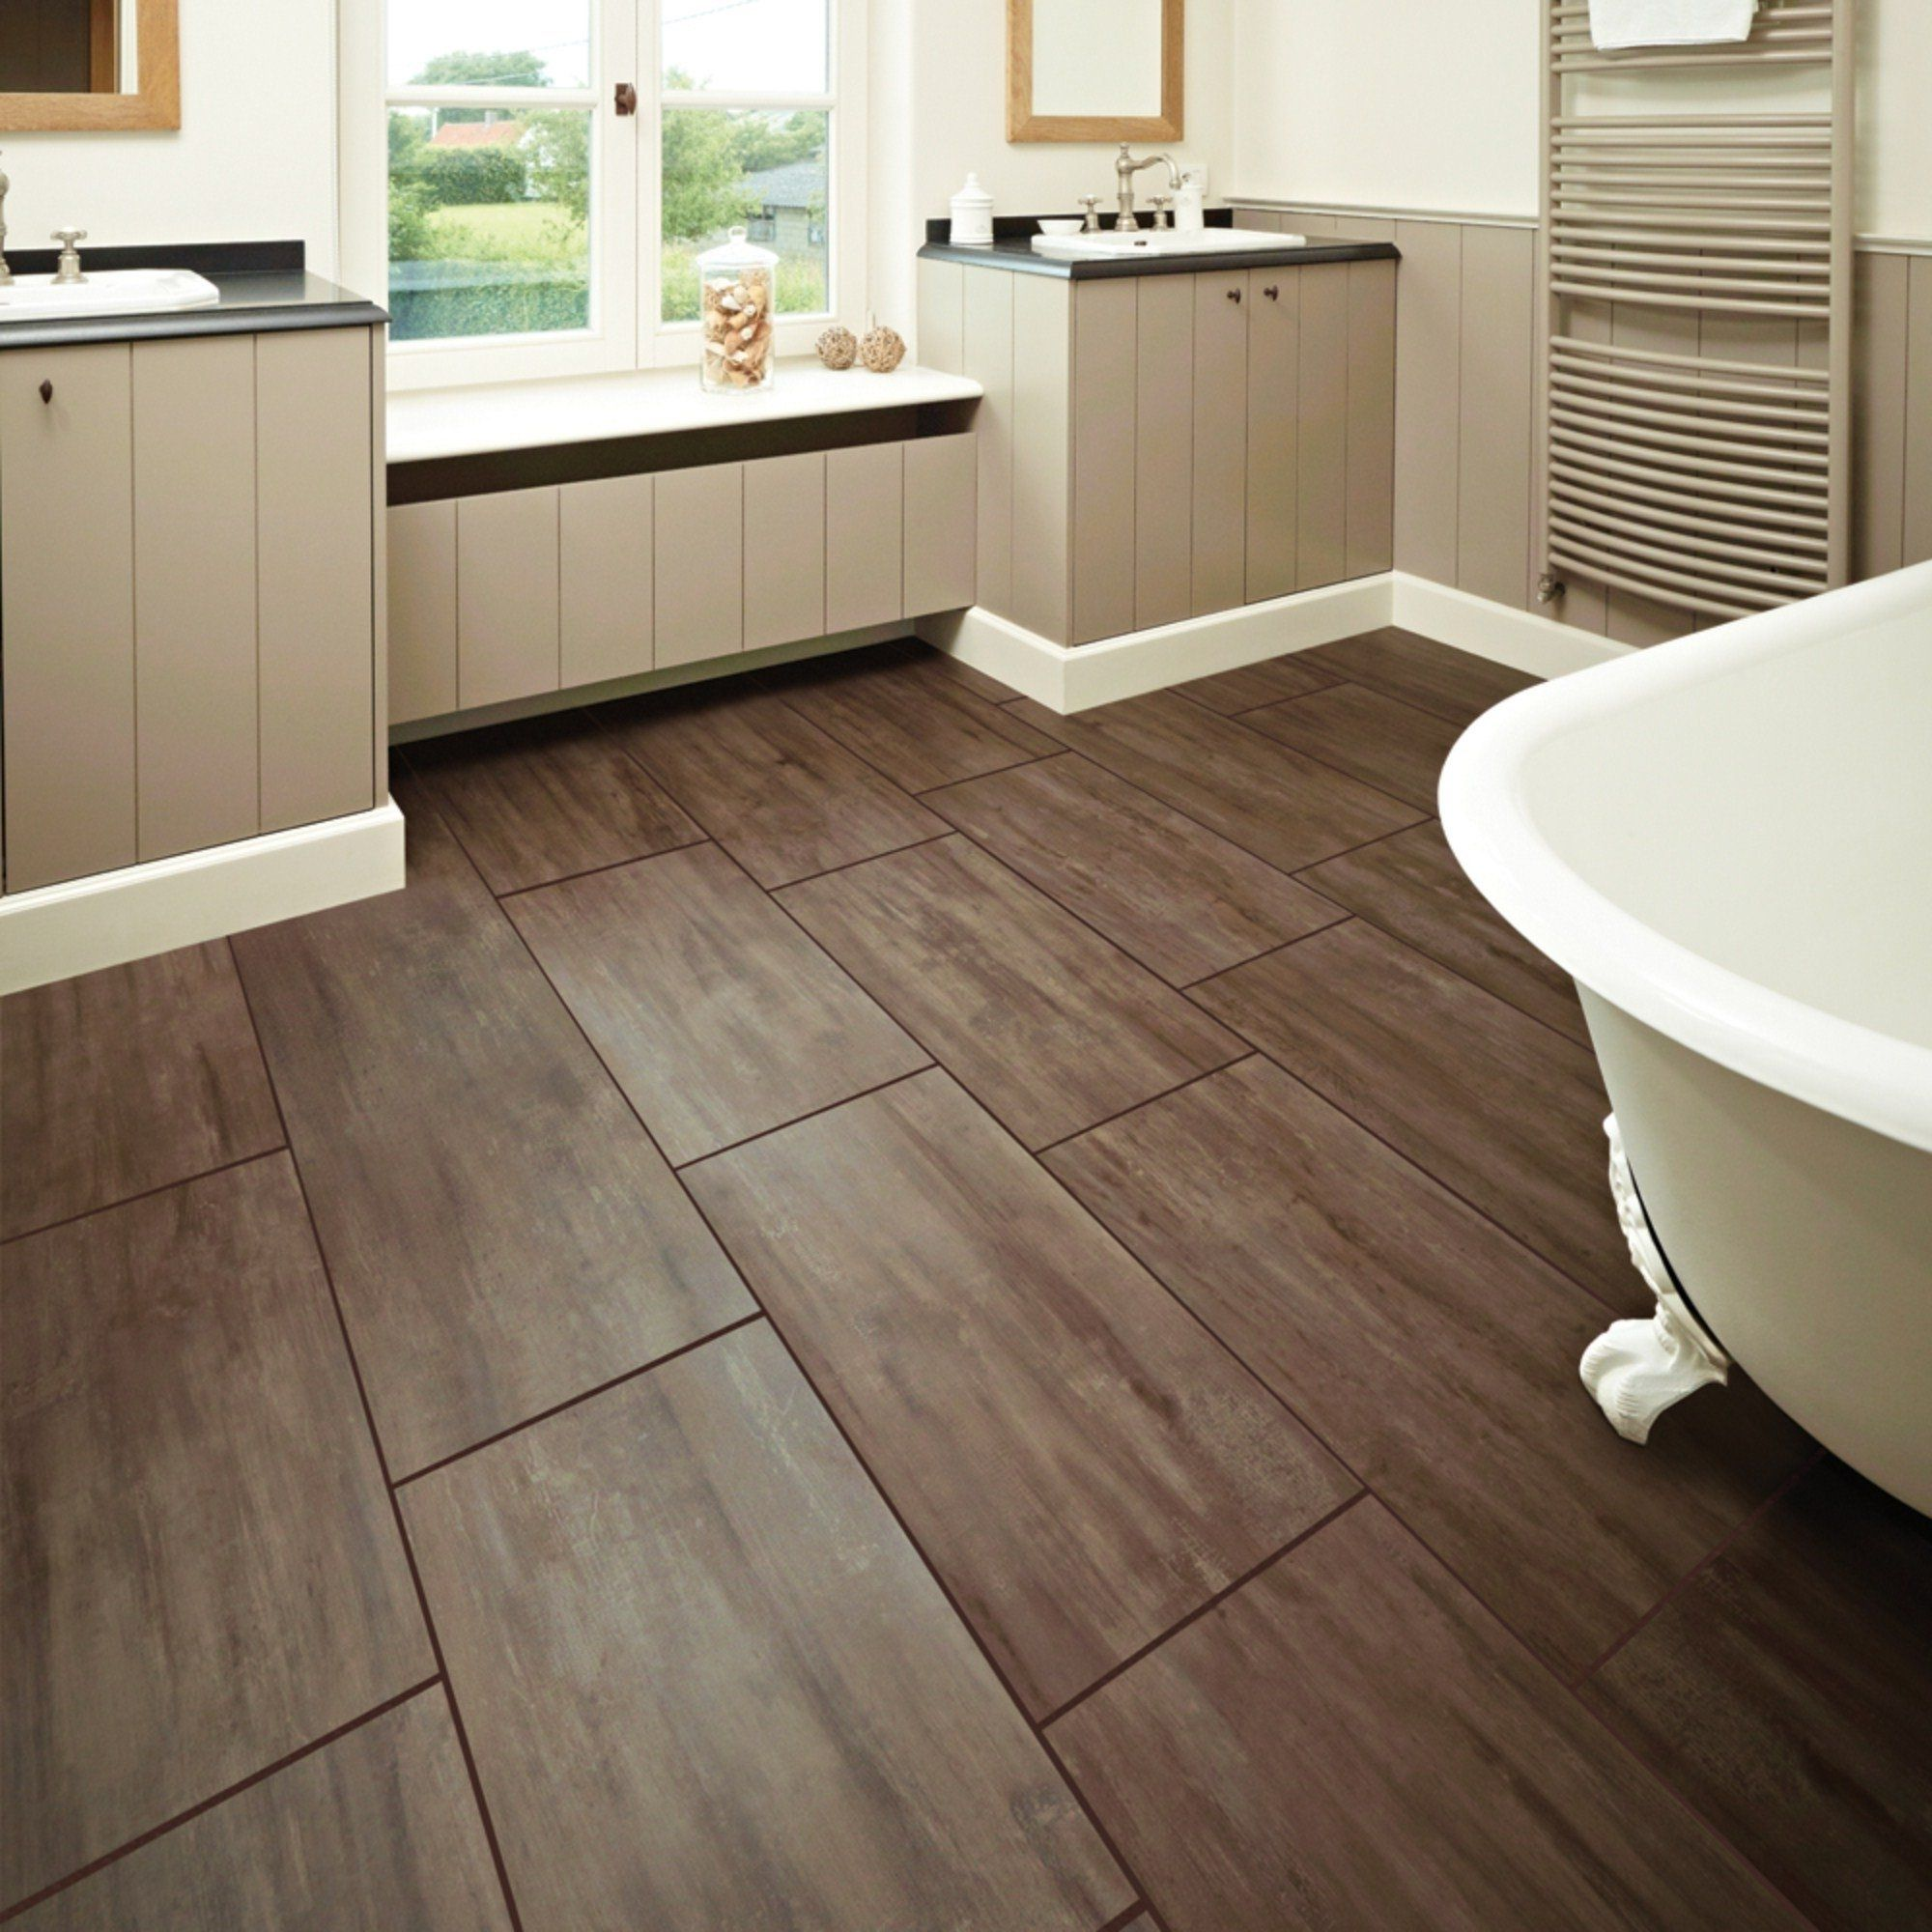 Slip Resistant Bathroom Floor Tiles Cheap bathroom